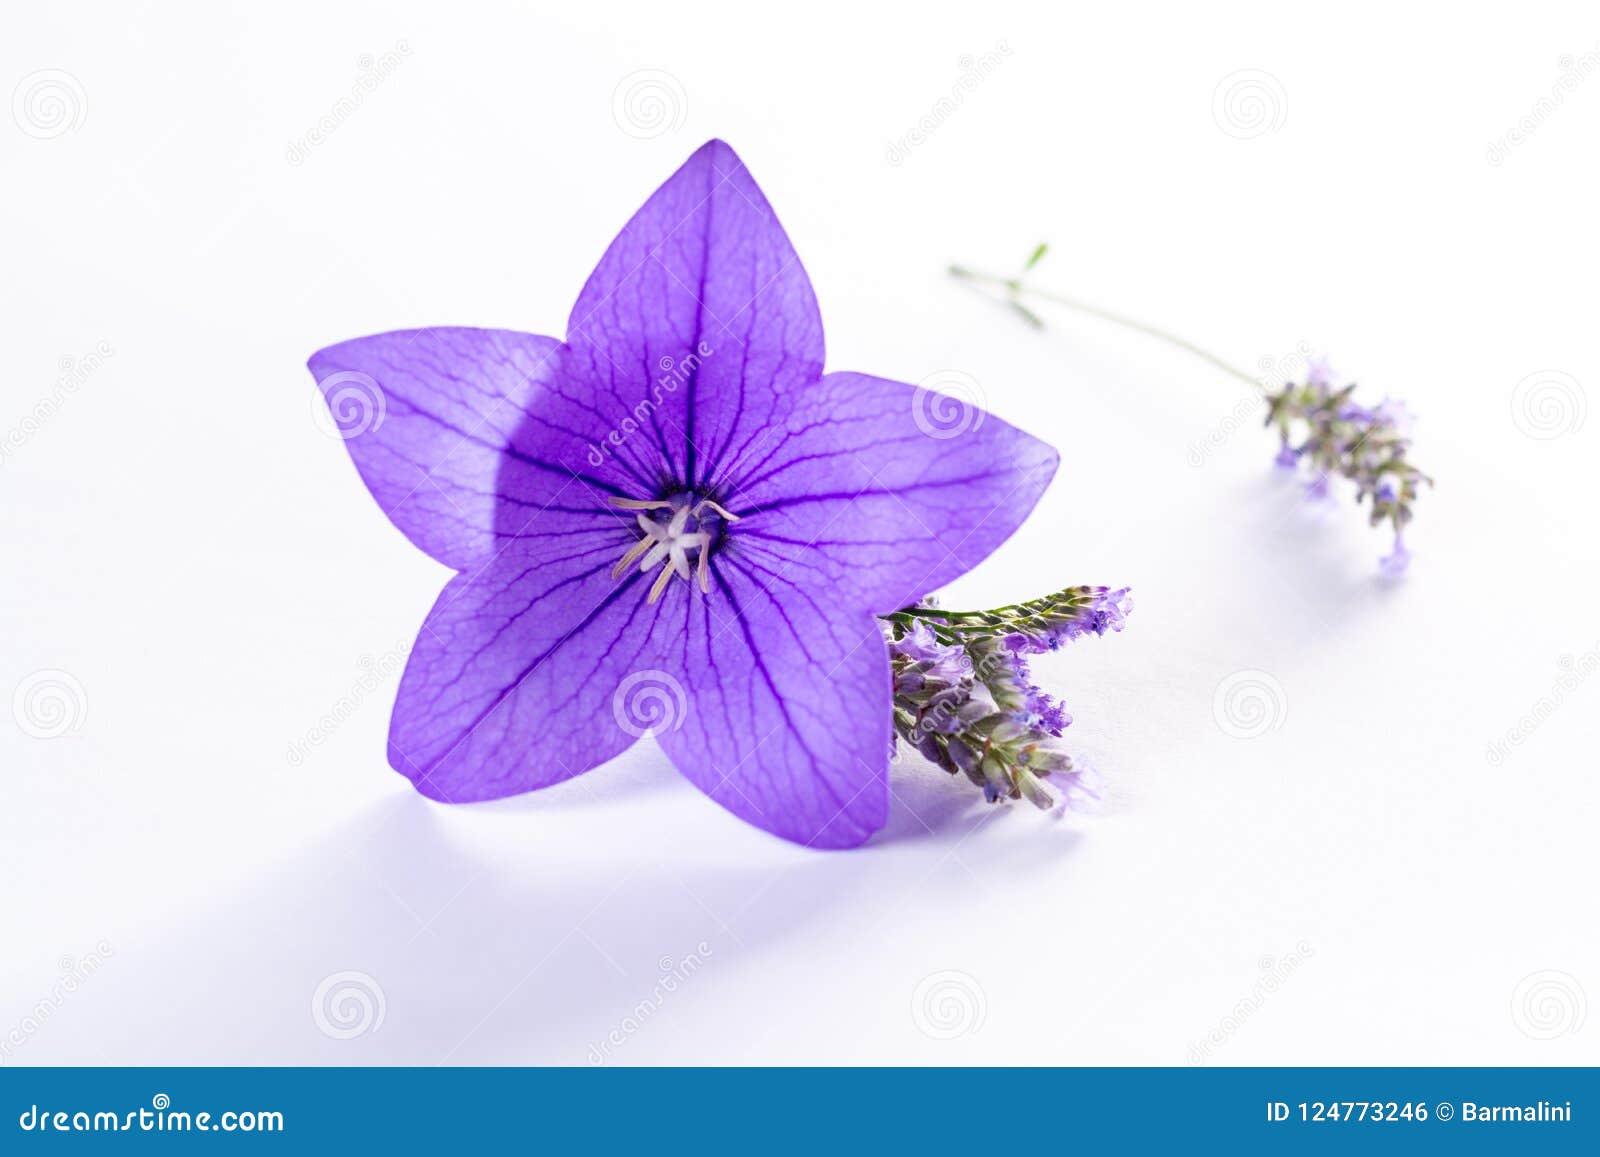 Elegant Small Boutonniere From Purple Balloon Flower Fresh Cut